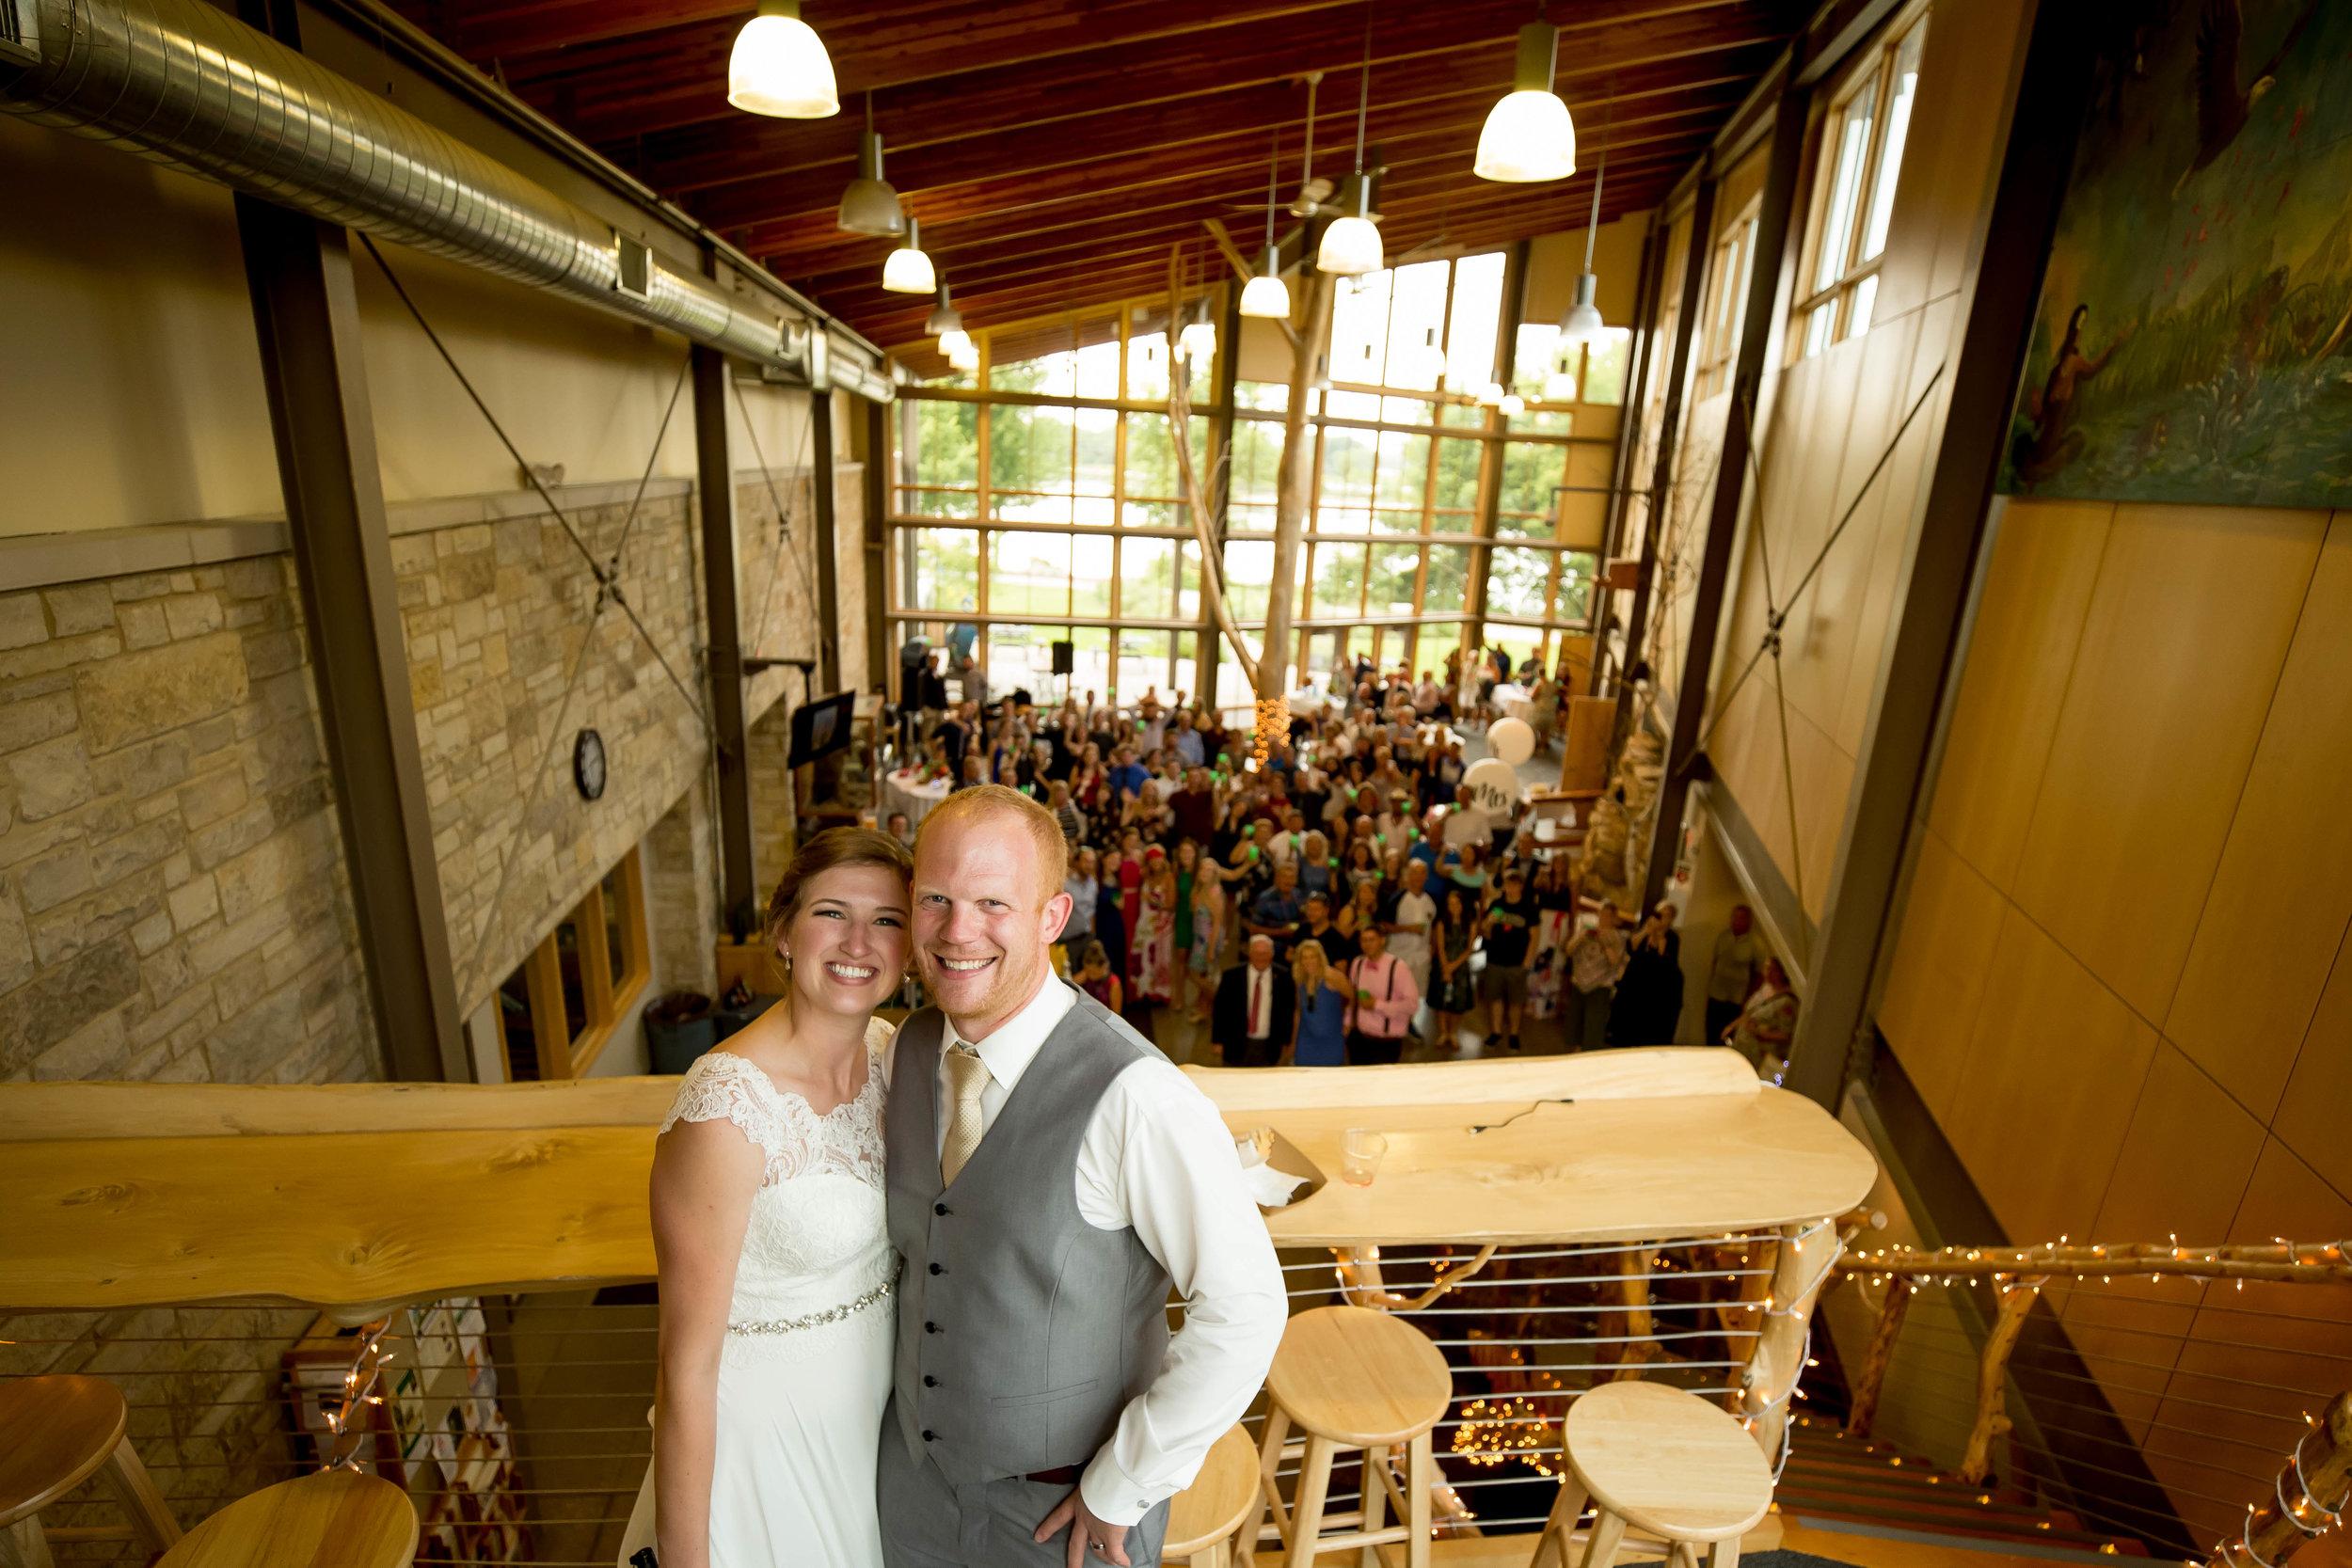 Severson Wedding 2017-0016.jpg